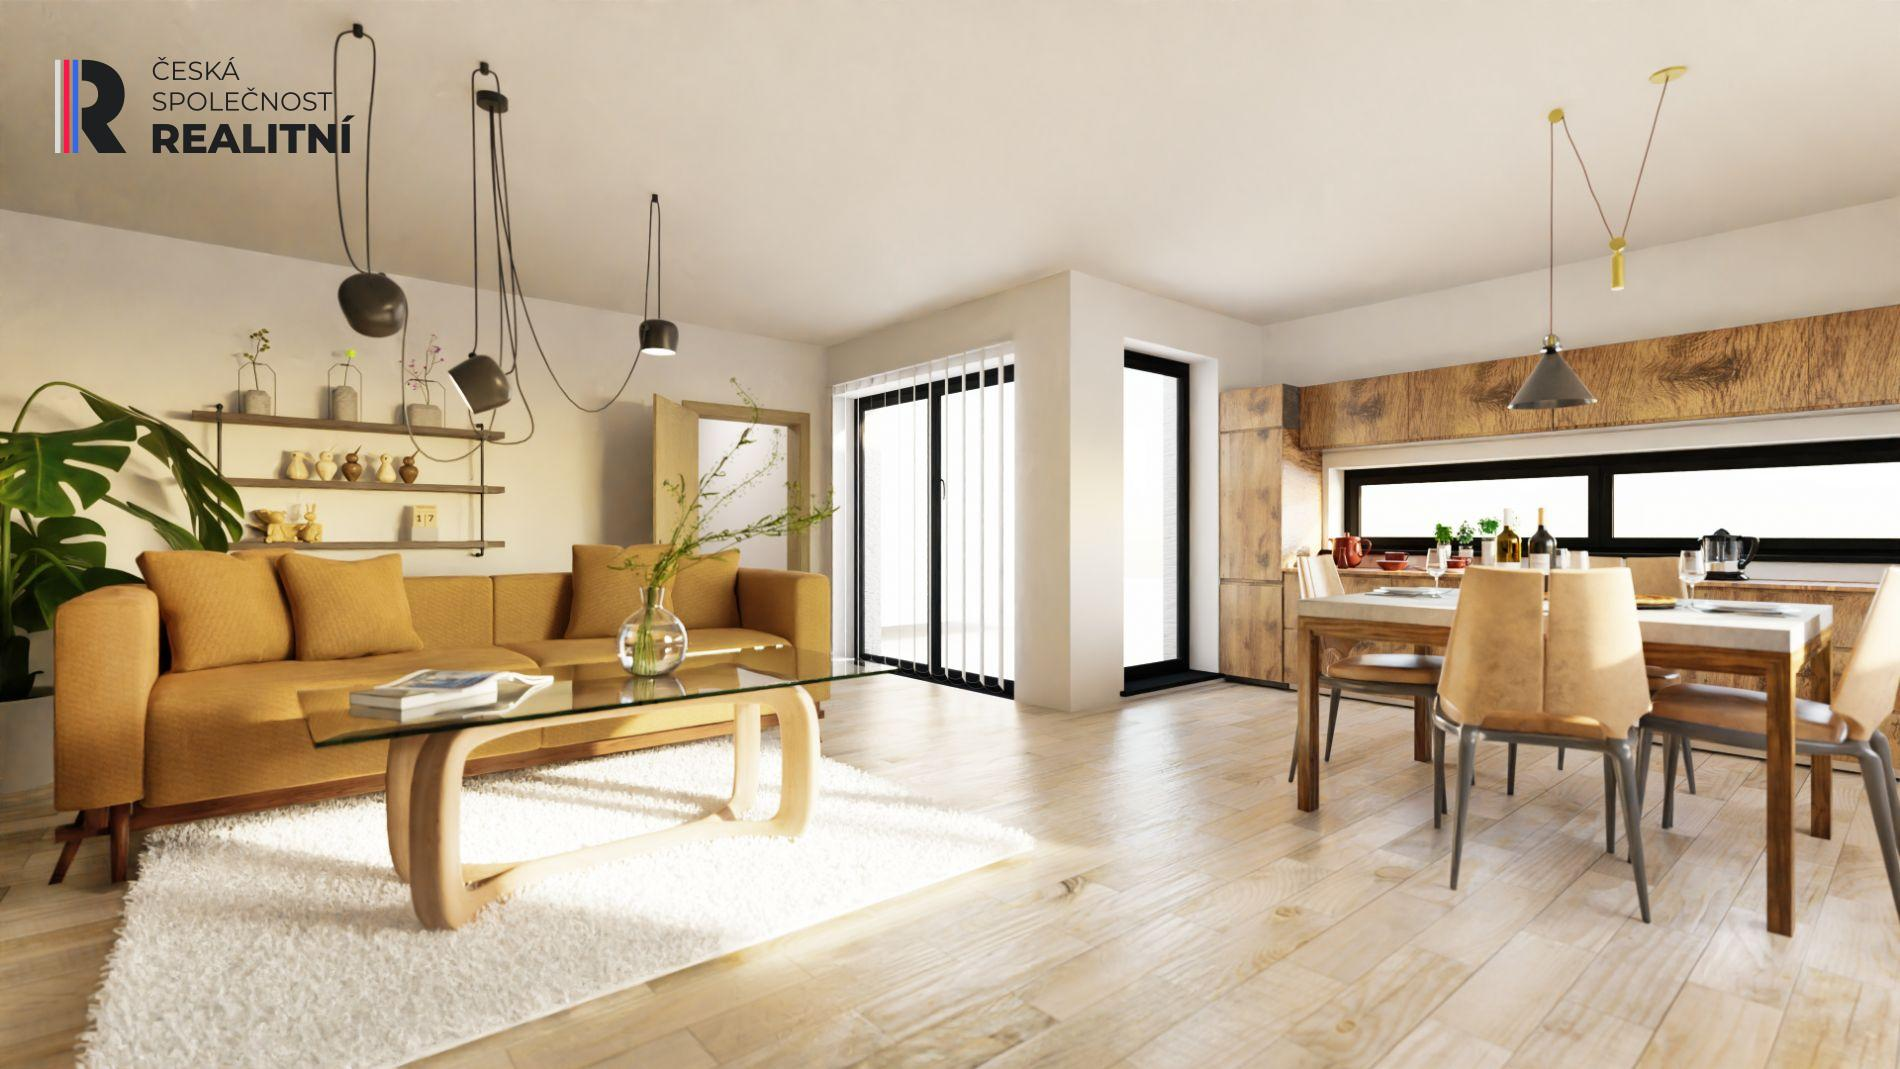 Prodej bytu 4+kk Rajhradice, 141 m2, 200 m2 zahrada